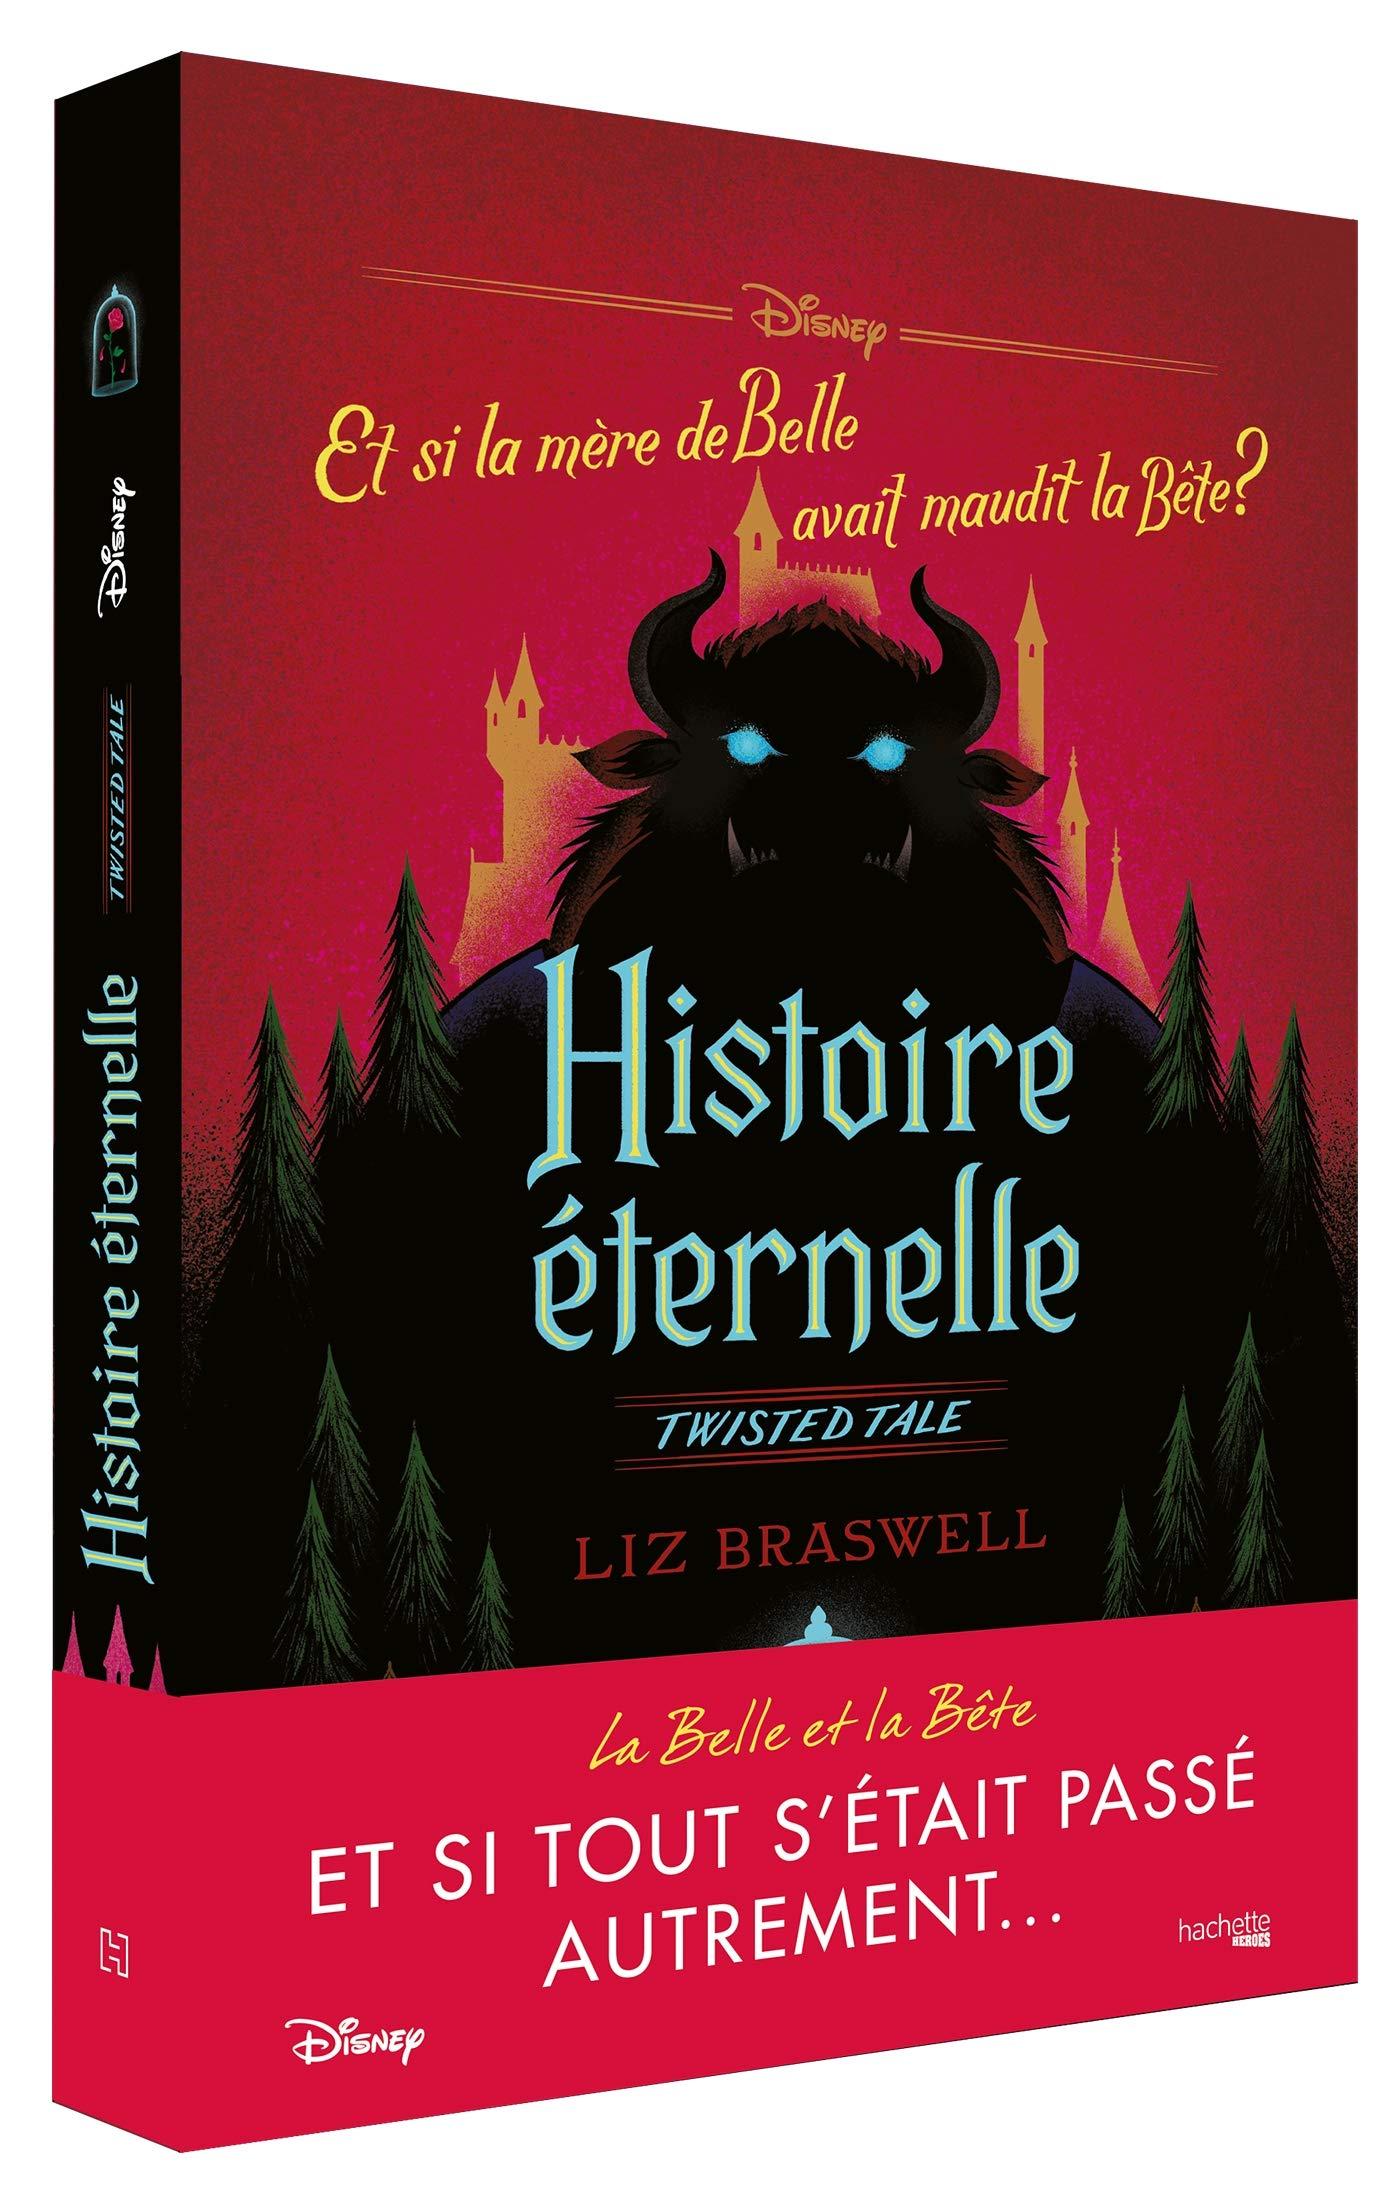 Disney Roman - Histoire éternelle Twisted Tales